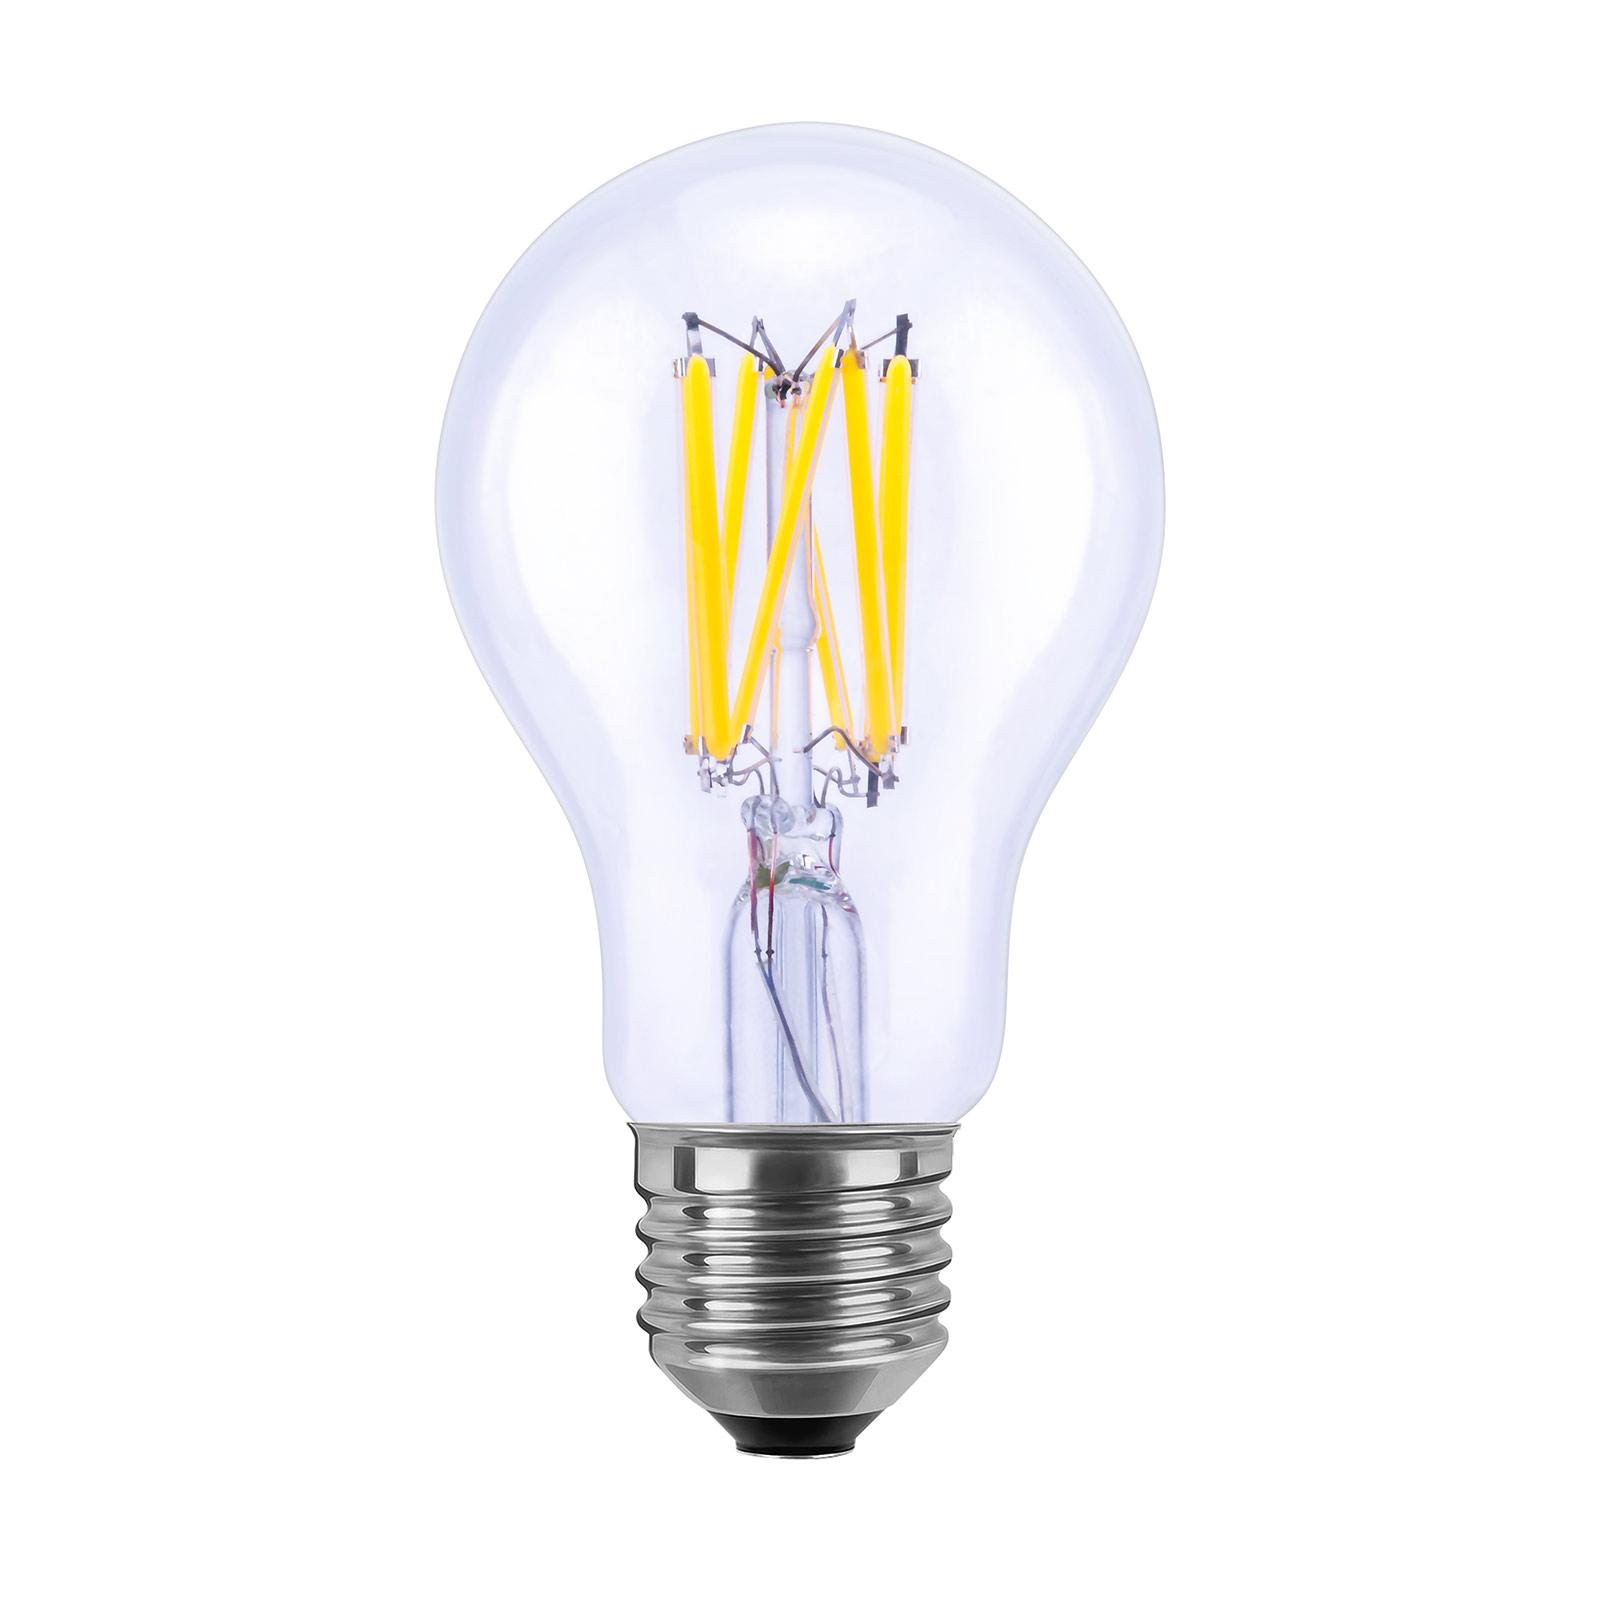 SEGULA LED-Lampe High Power, E27, 8W, 810lm, klar